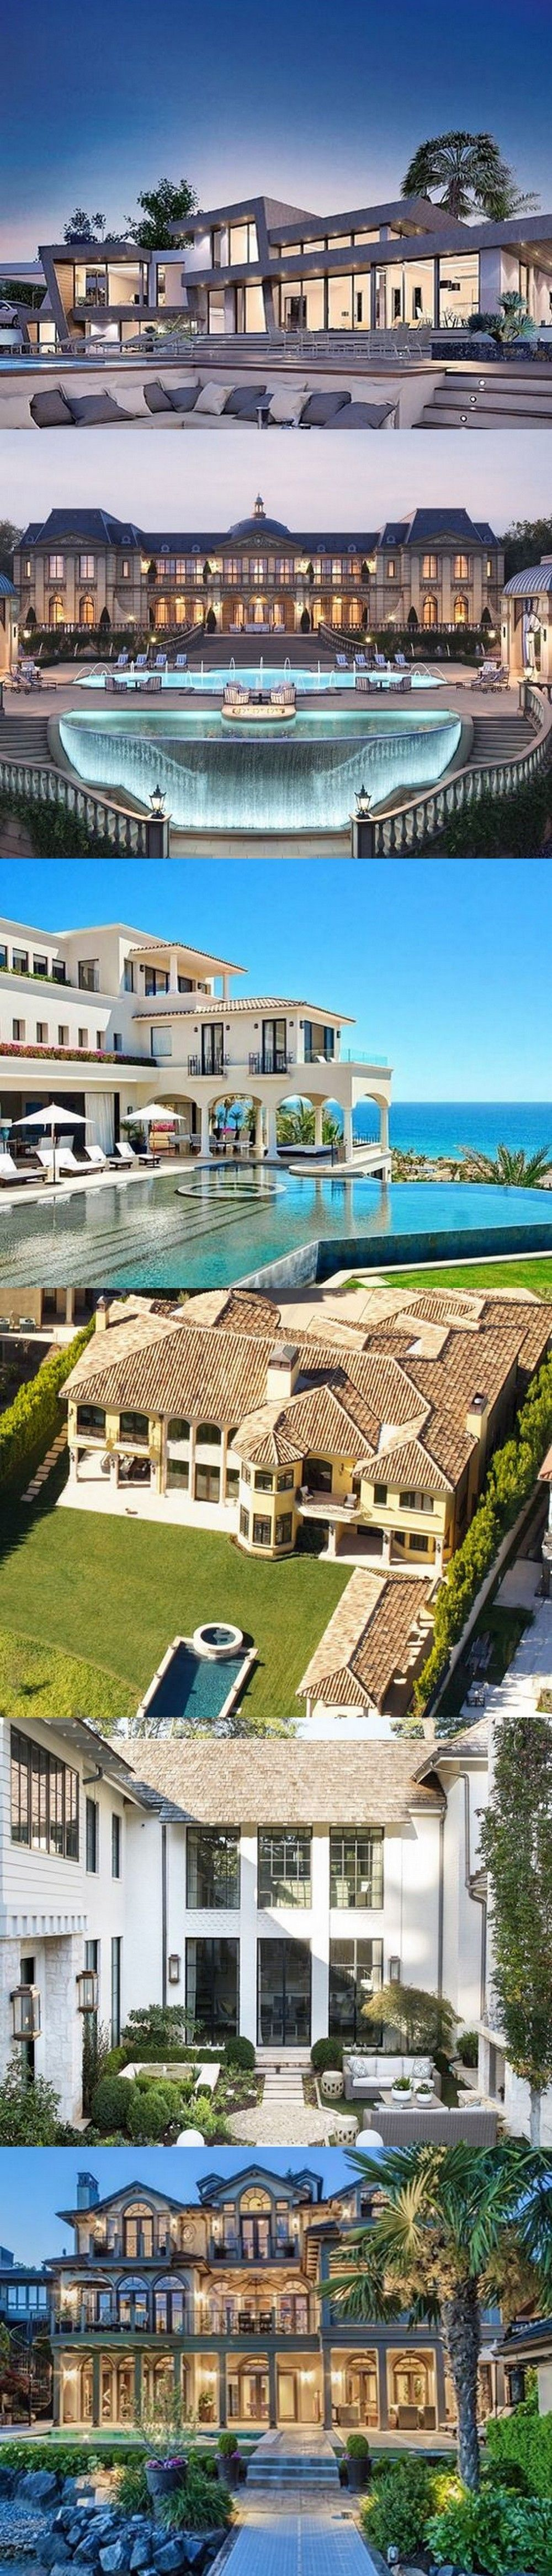 Stunning Dream Homes Mega Mansions From Social Media House